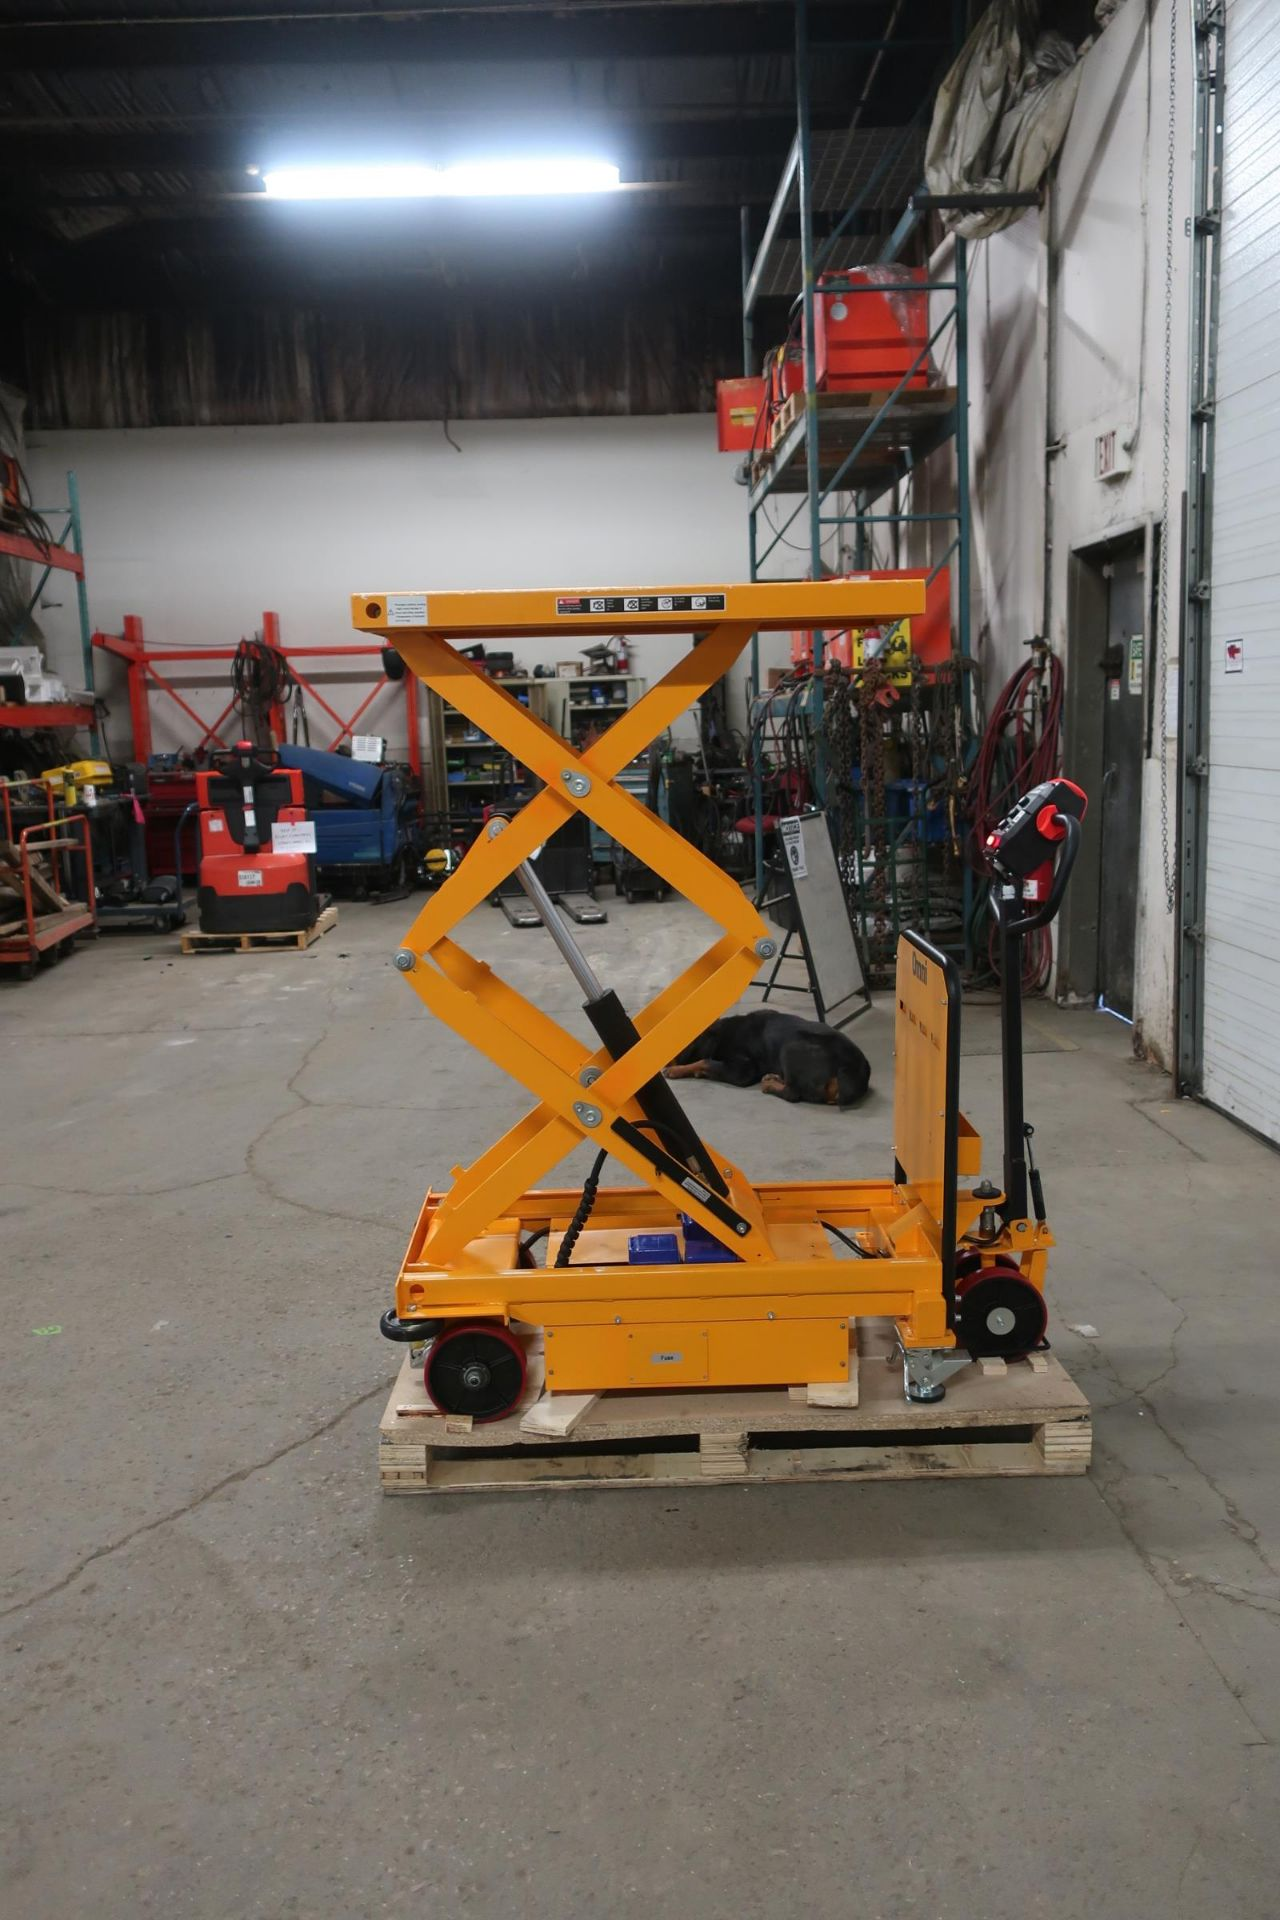 "MINT Omni Motorized Lift Table Platform 500kg / 1100lbs capacity and 1720mm / 68"" Lift Height UNUSED"